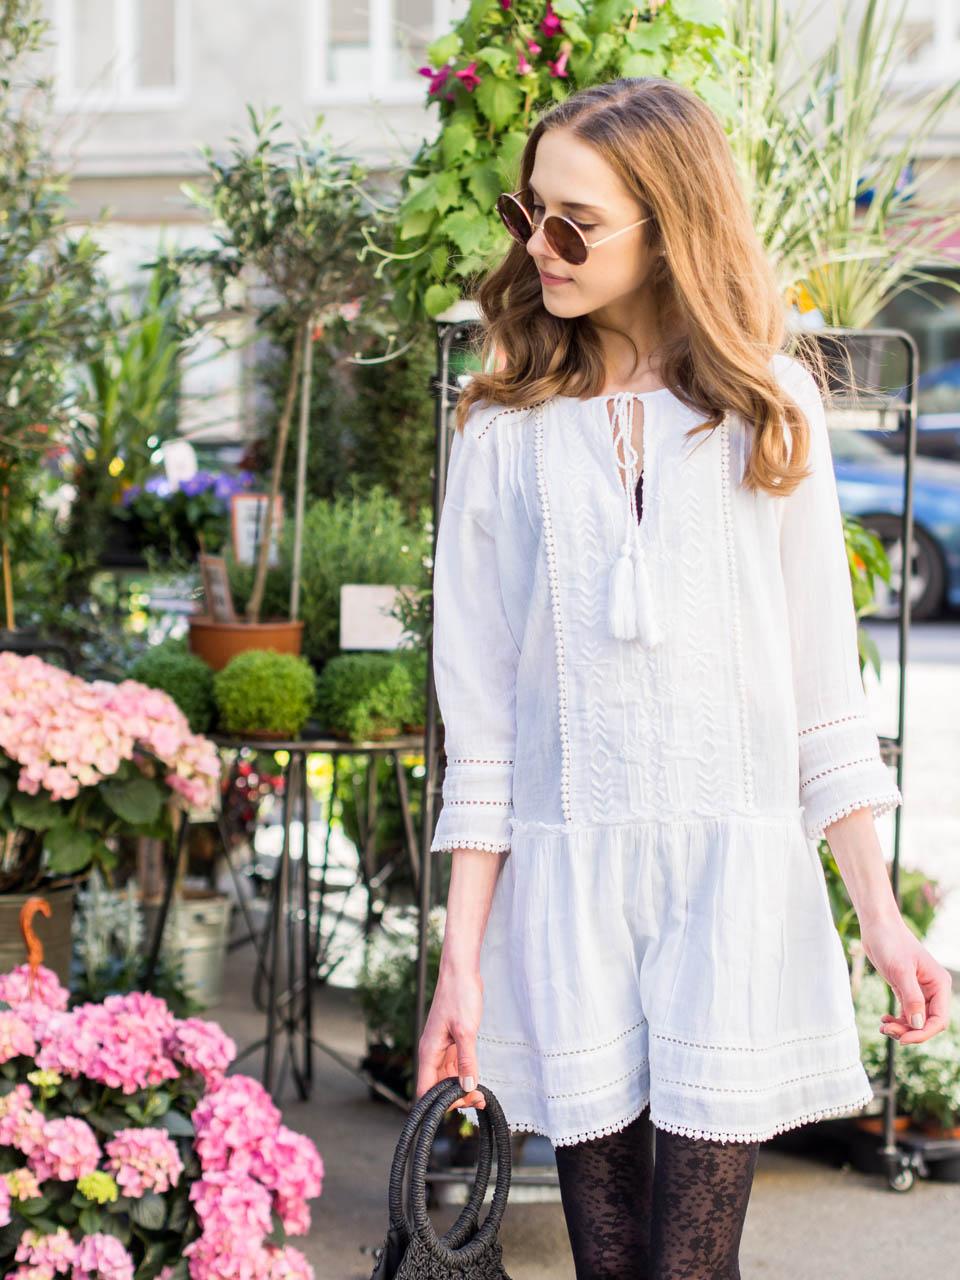 fashion-blogger-summer-outfit-inspiration-layers-white-dress-denim-jacket